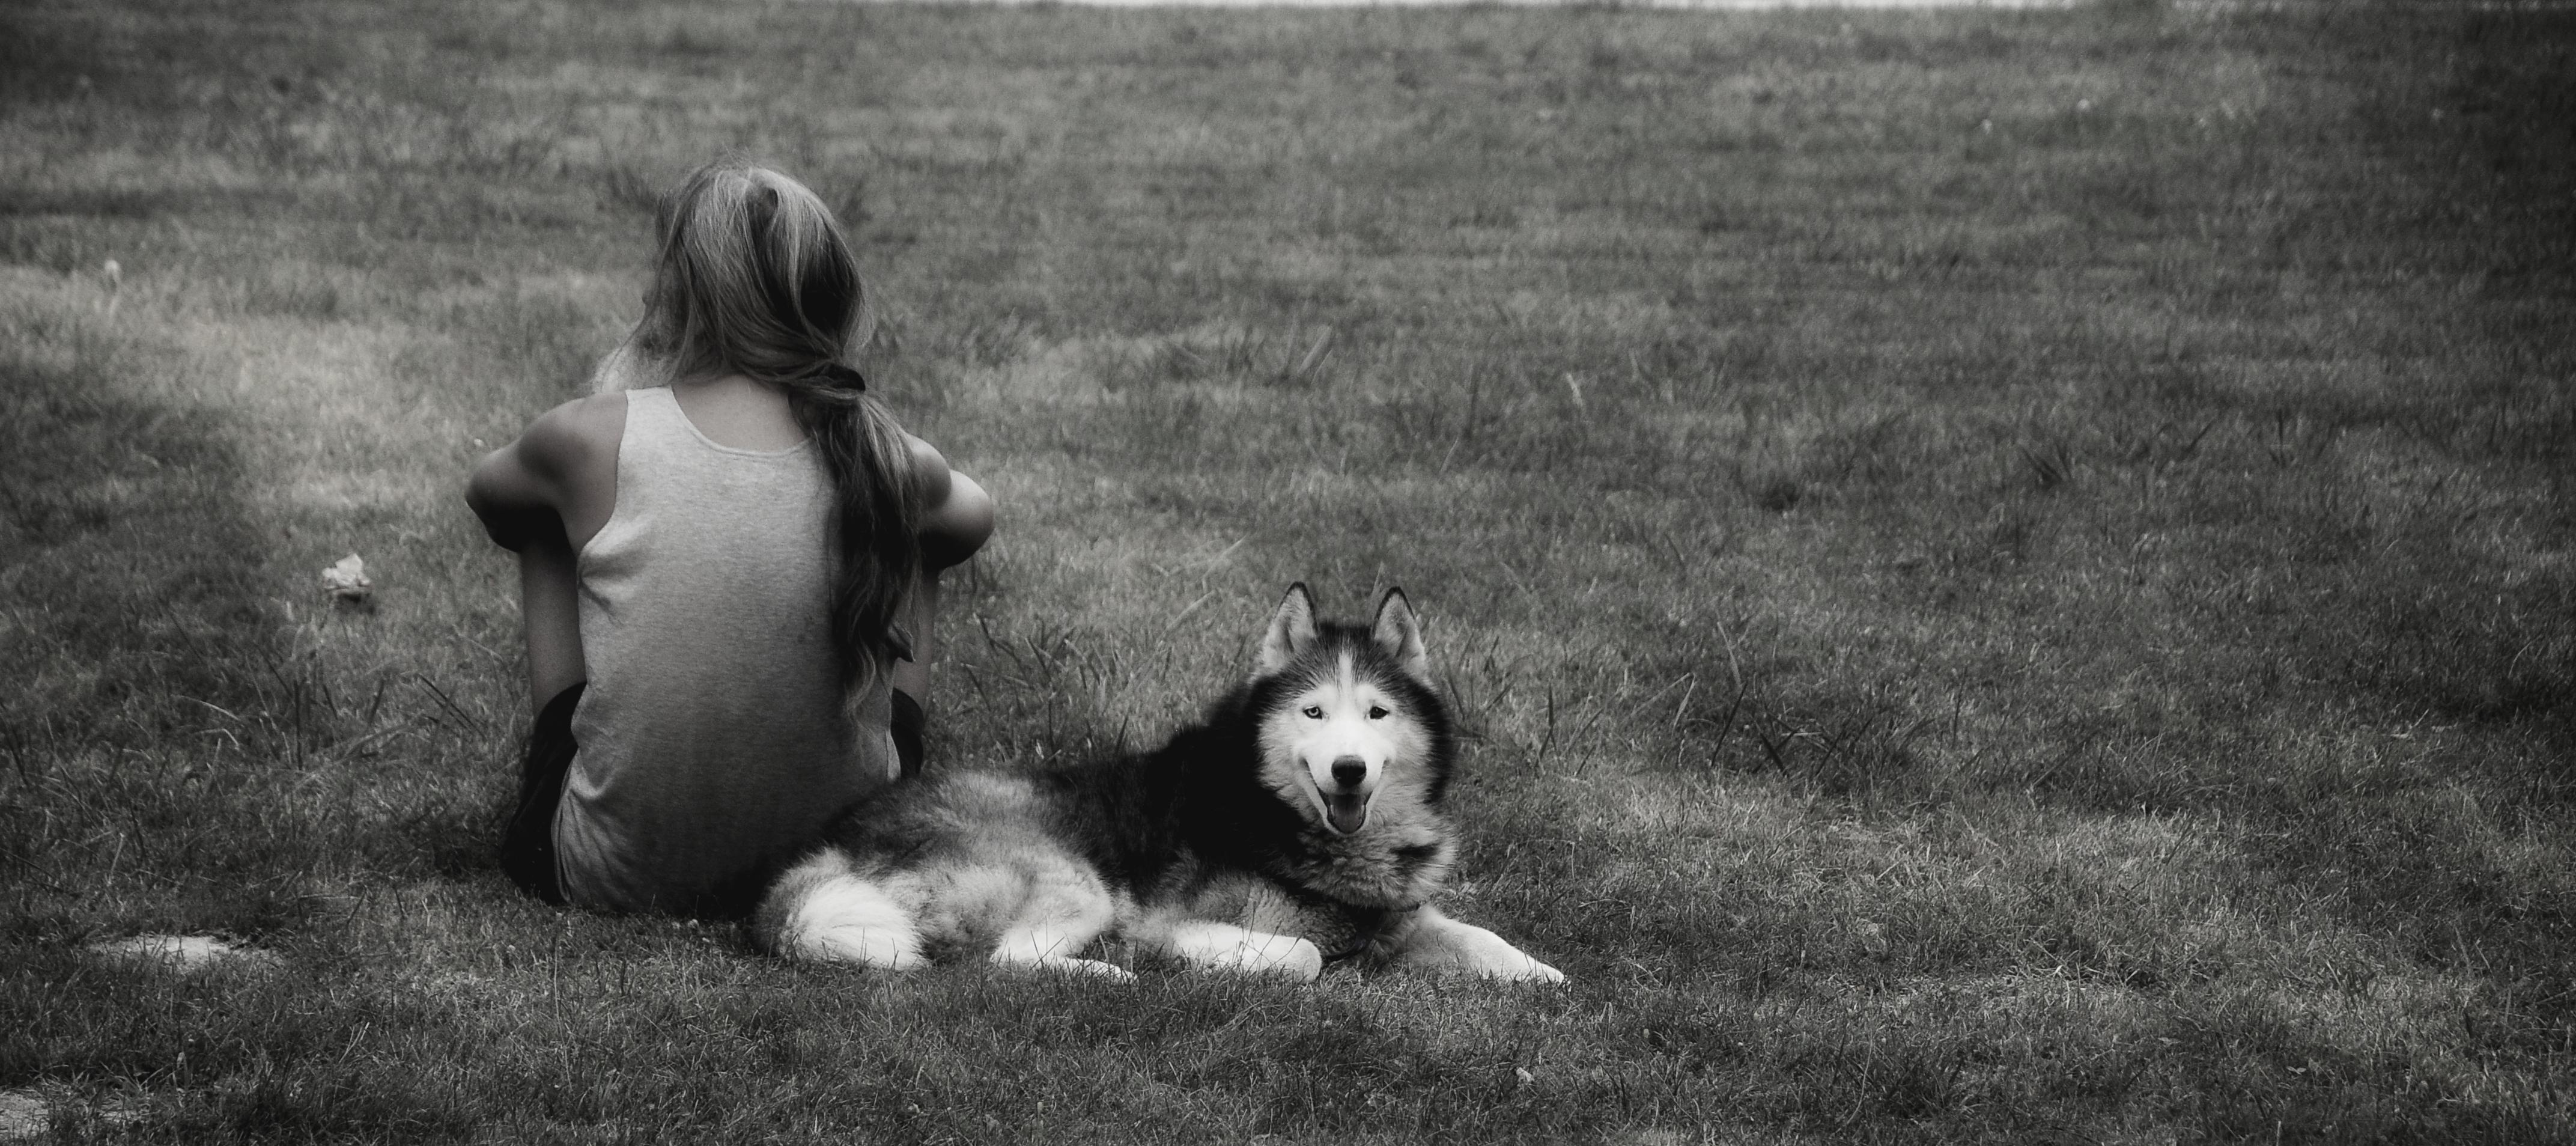 čovjek i pas